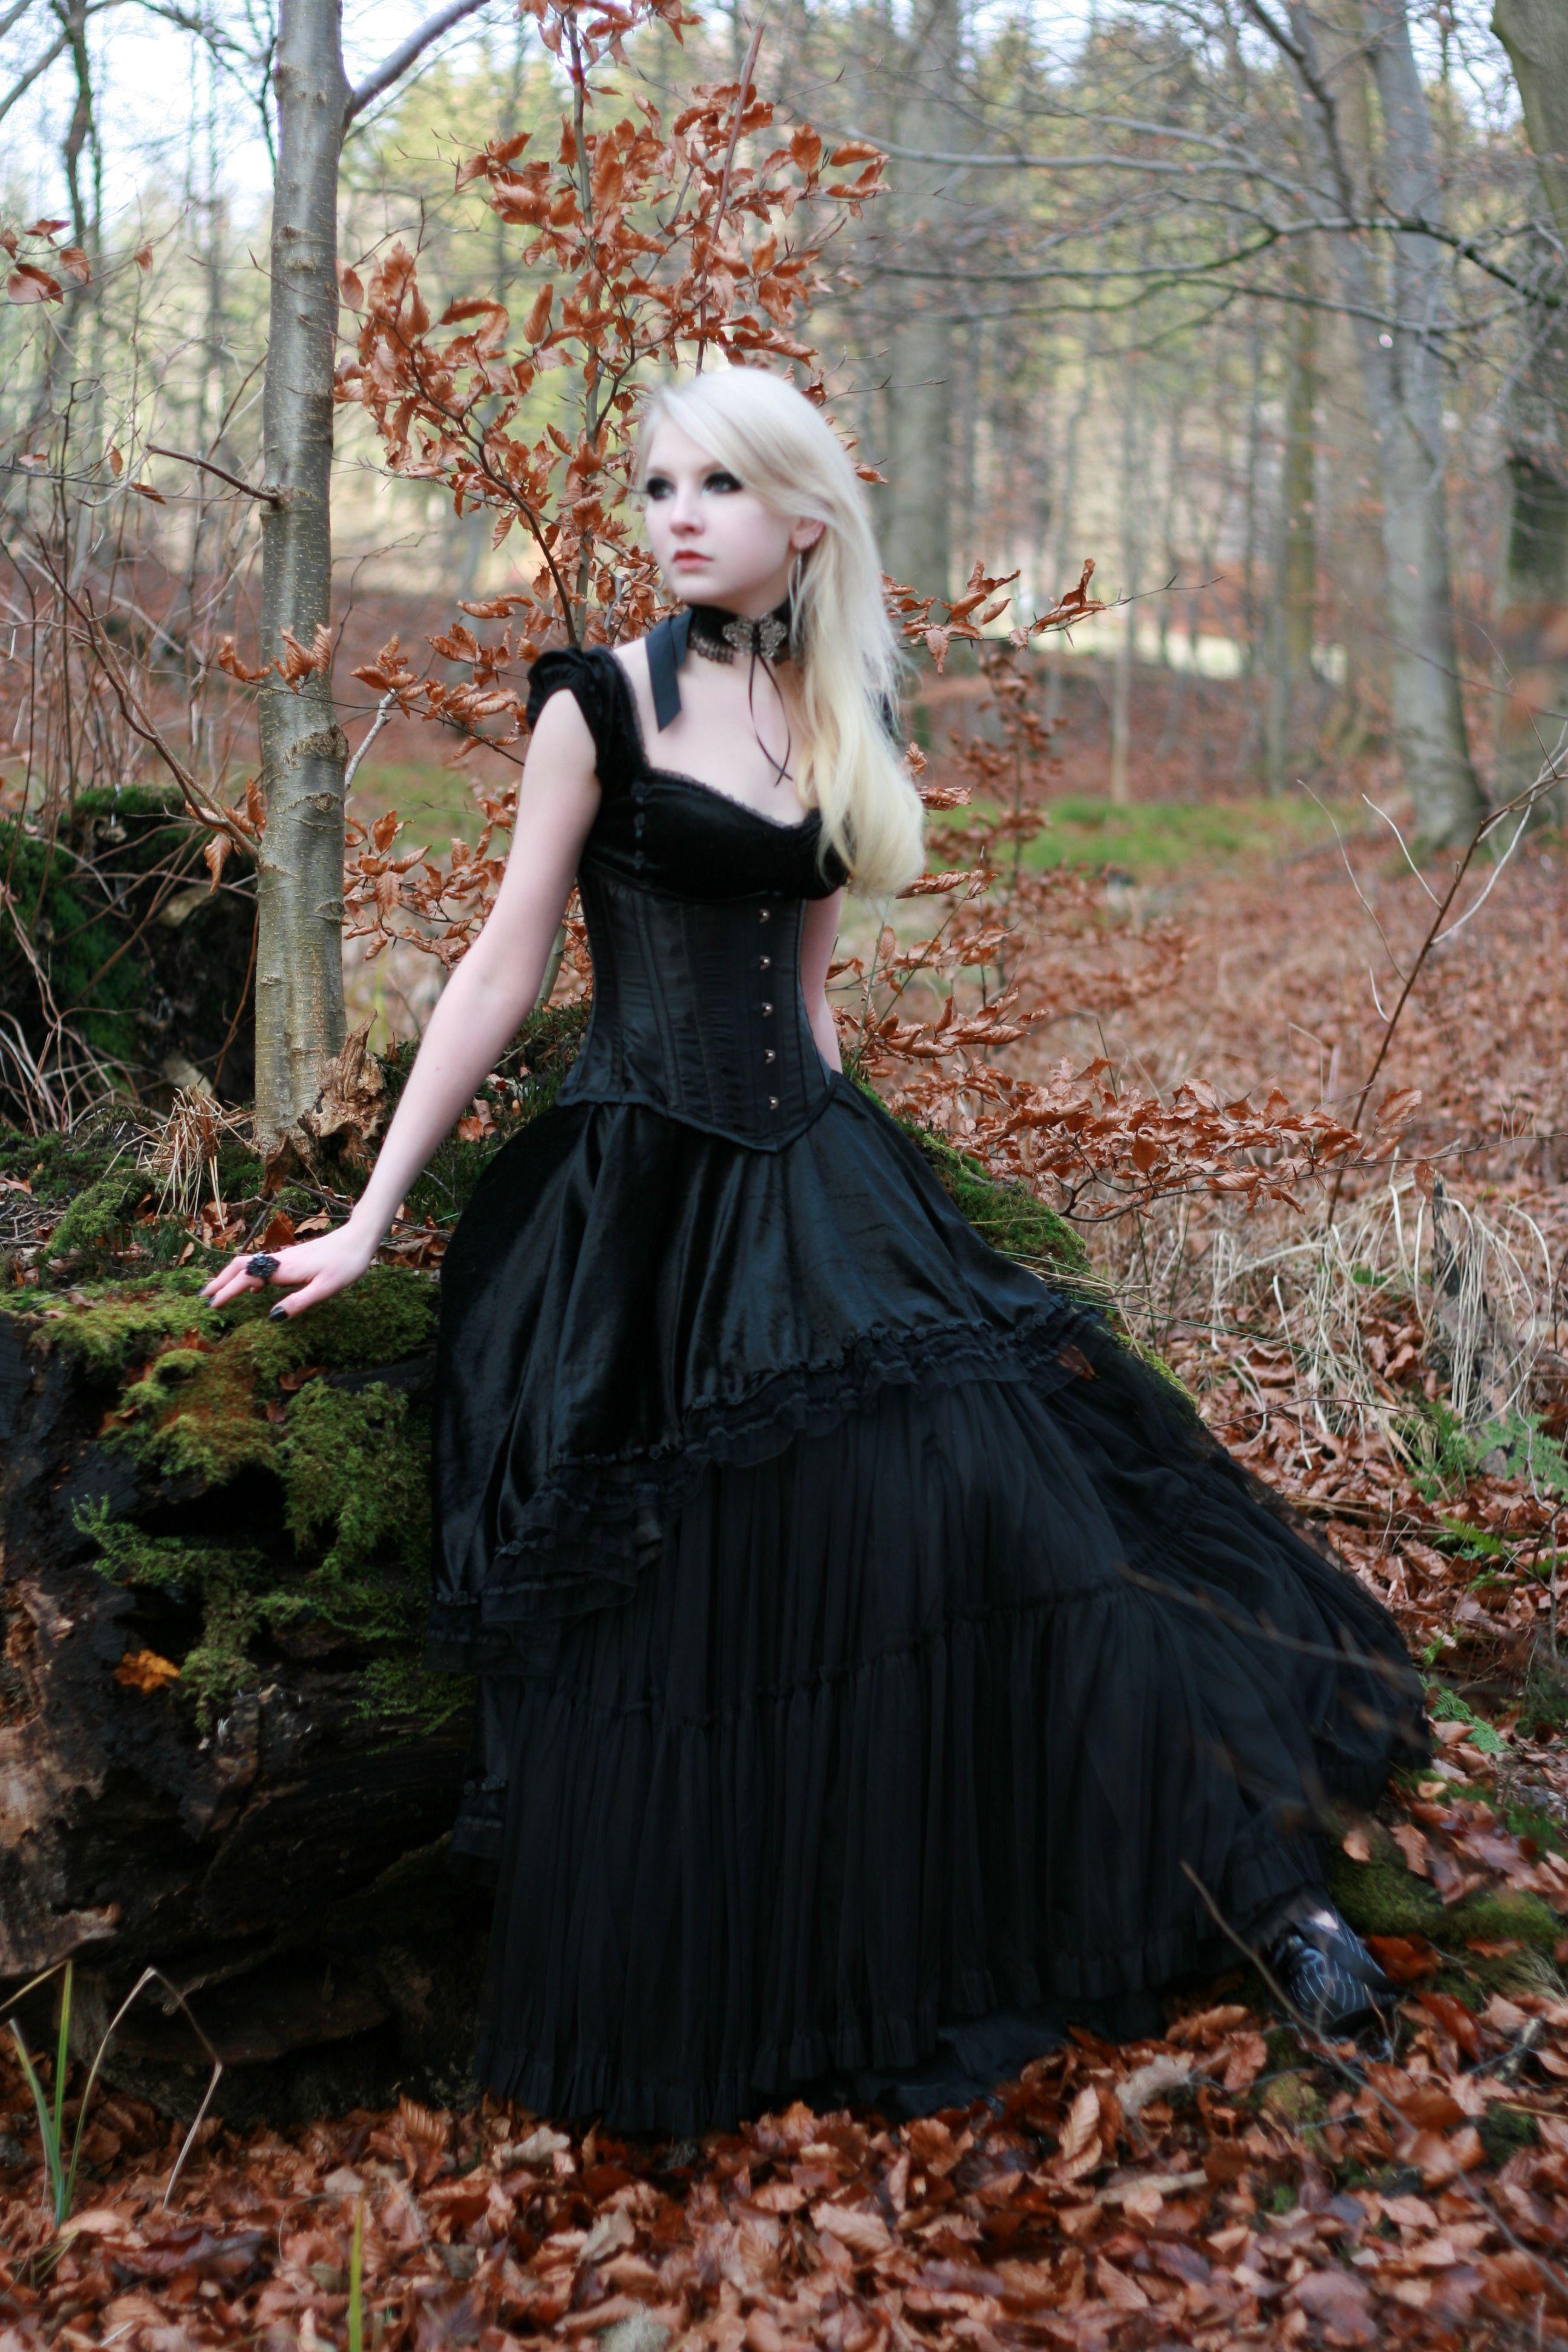 Pin von Amelia Paech-Enever auf Hair Clothes Beauty | Pinterest ...